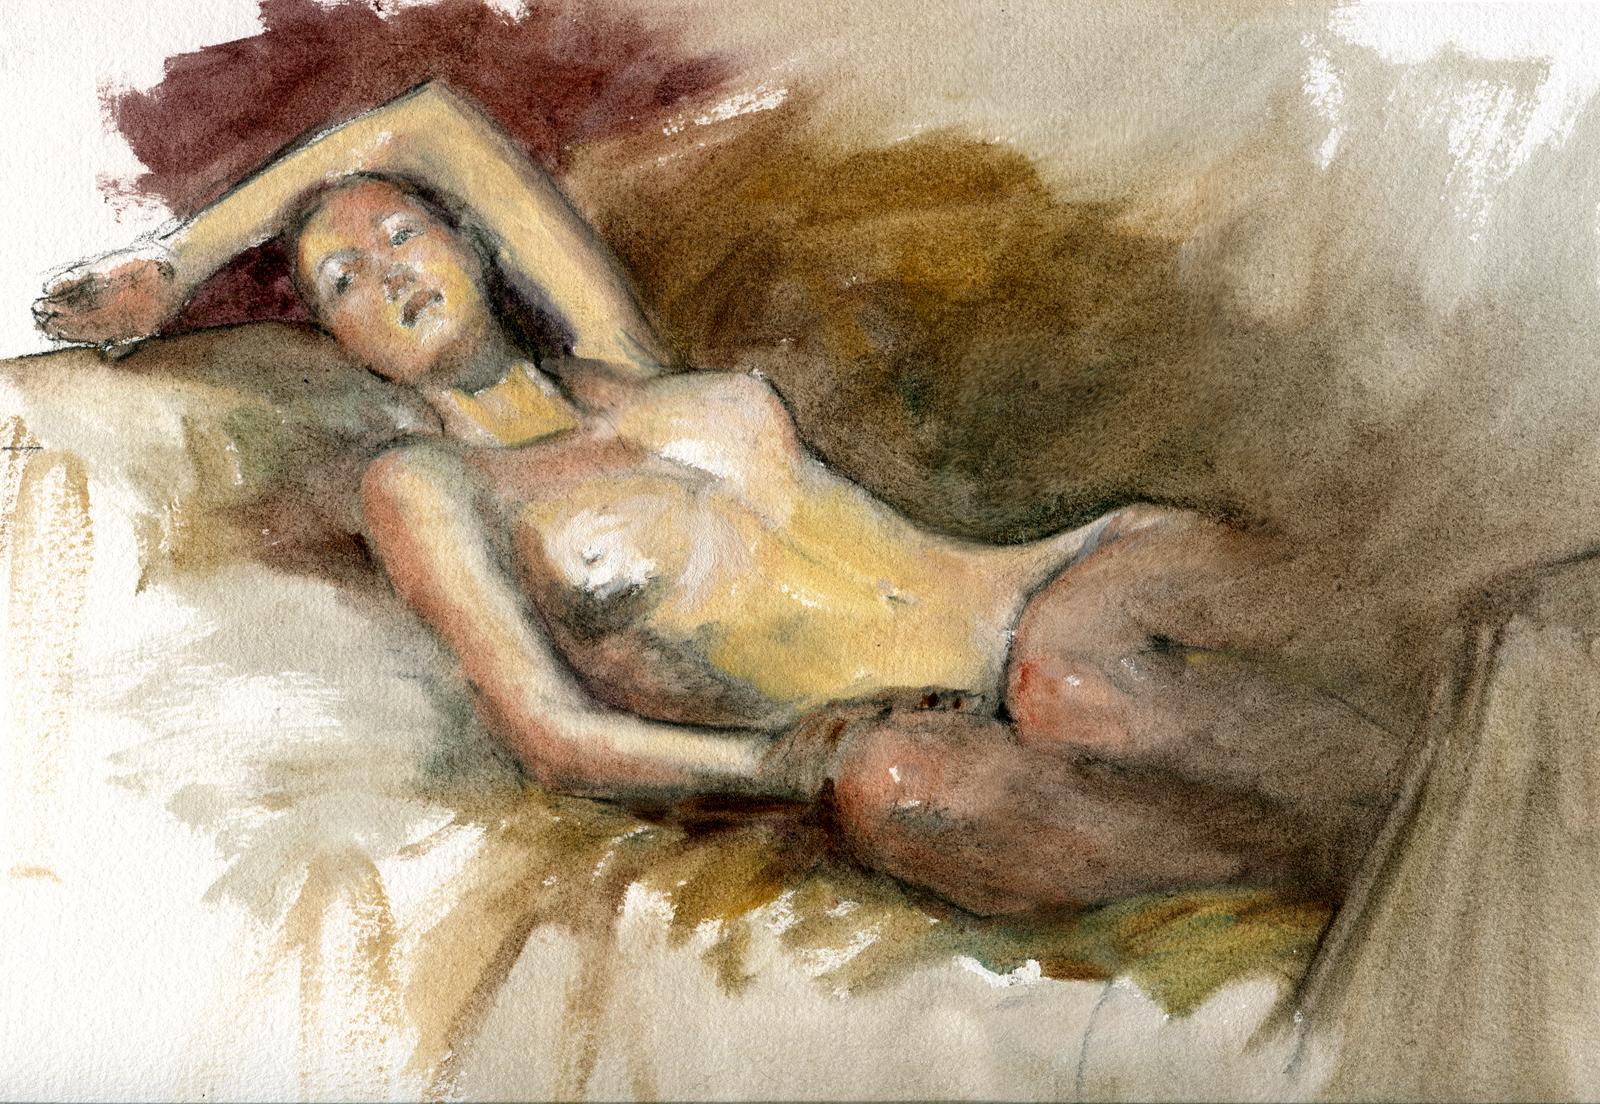 kaif-victorian-nude-paintings-amateur-video-girls